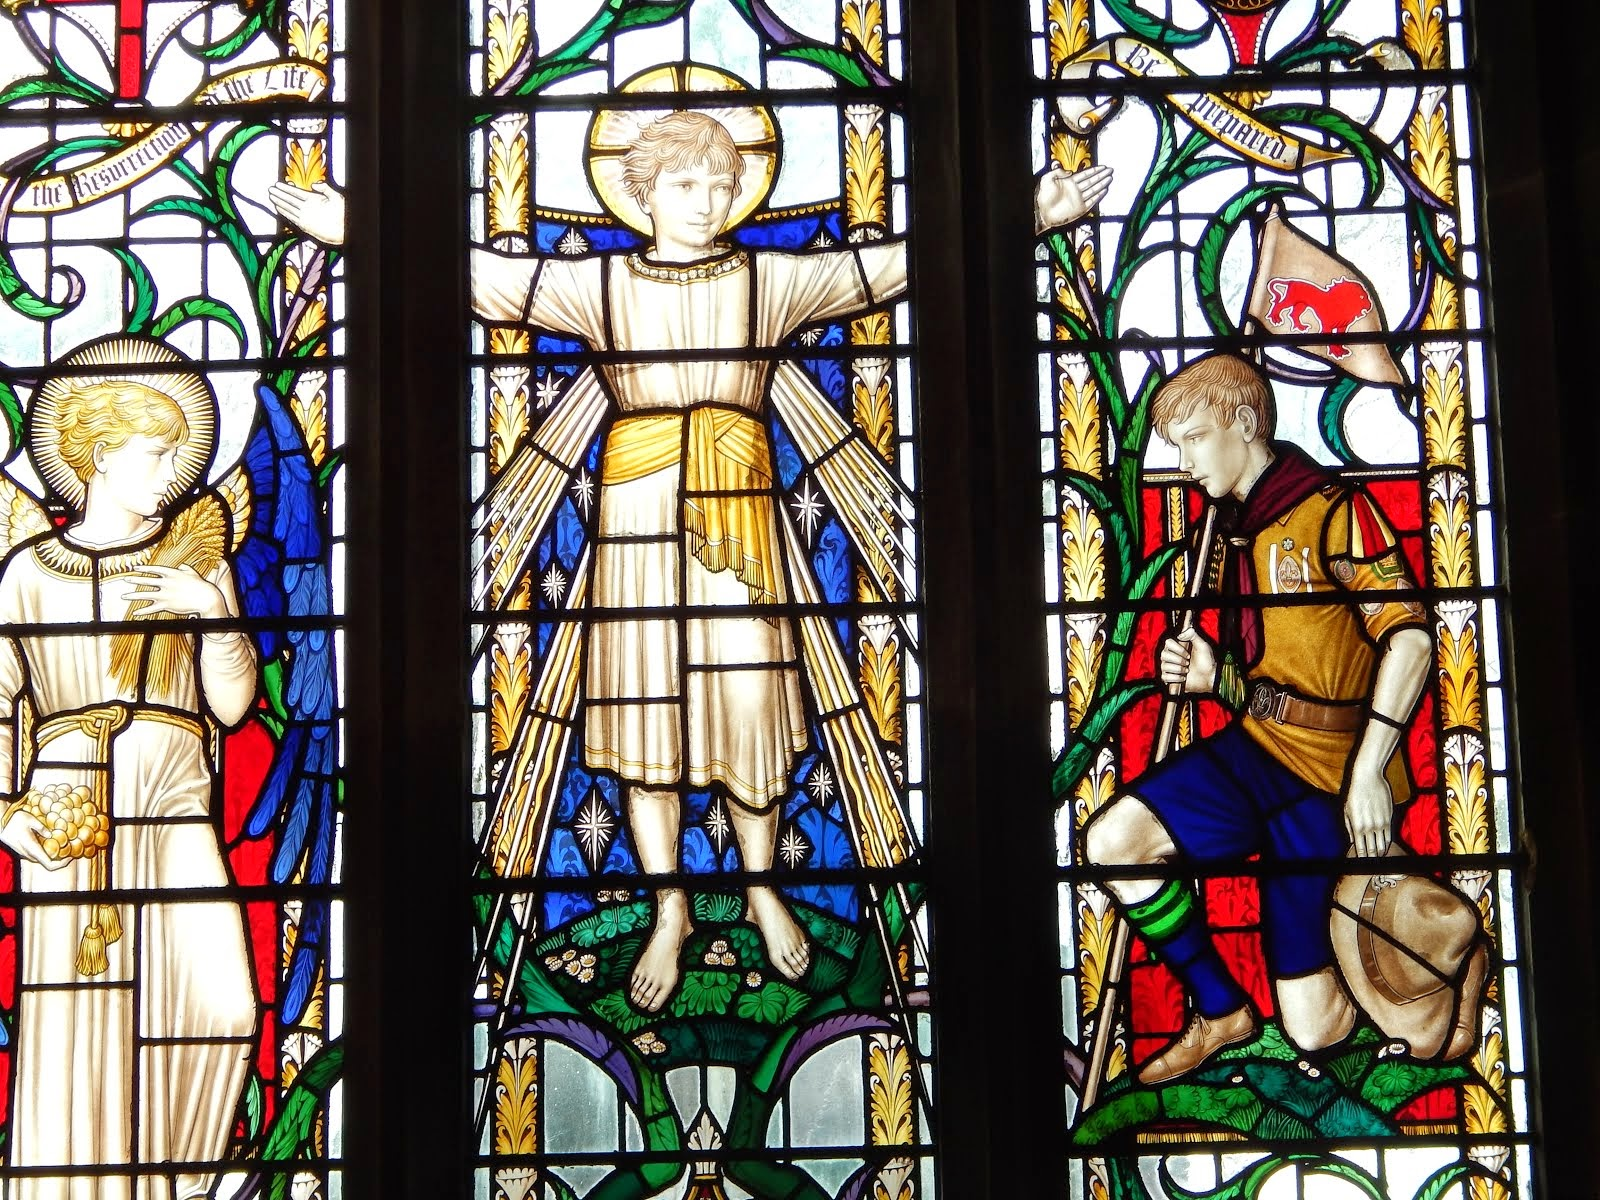 Dannan Window in the Church of the Resurrection